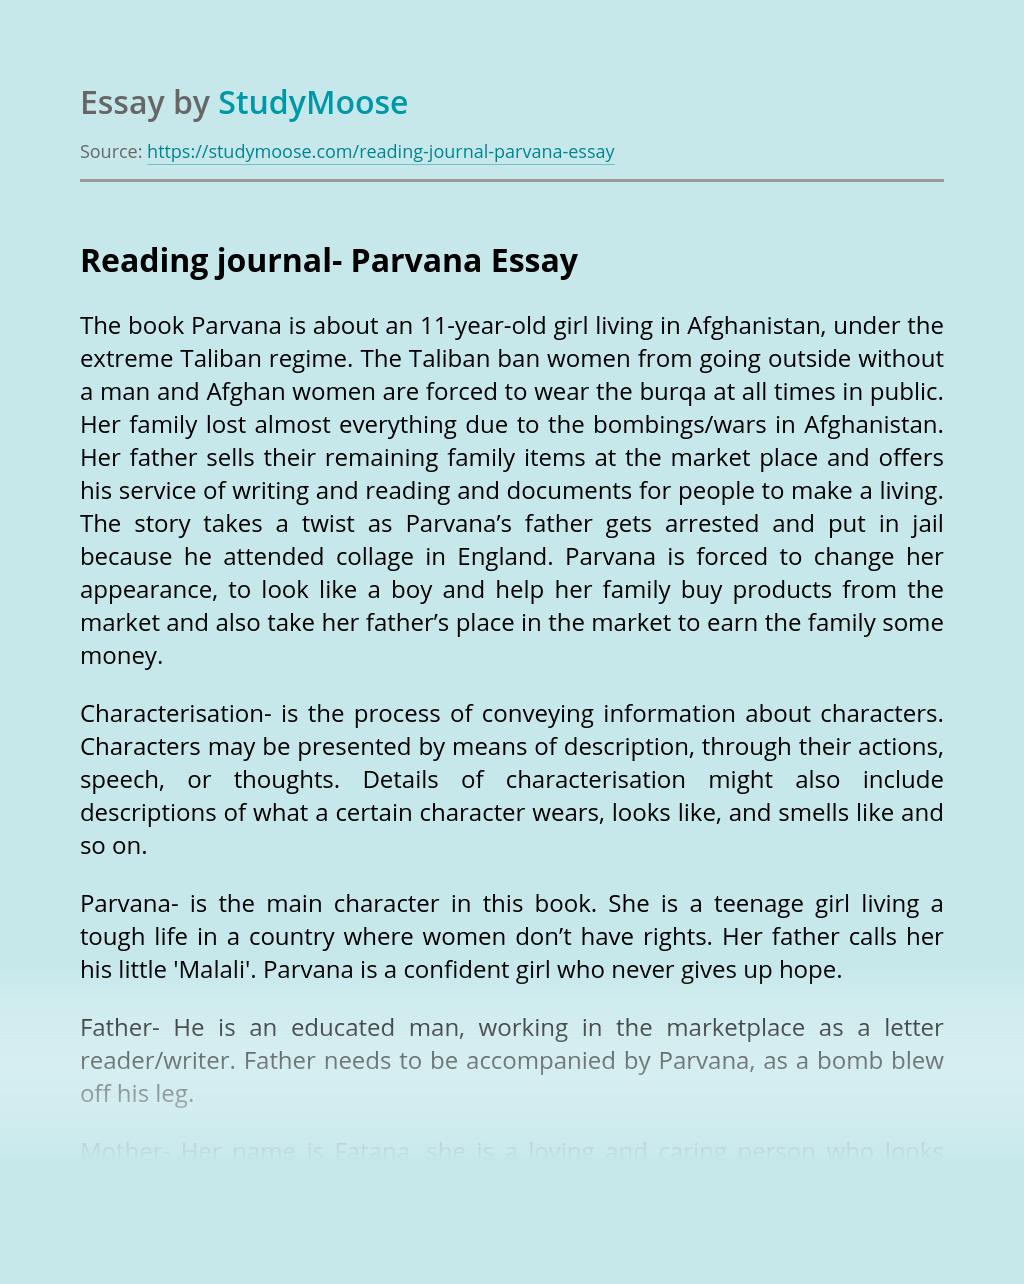 Reading journal- Parvana